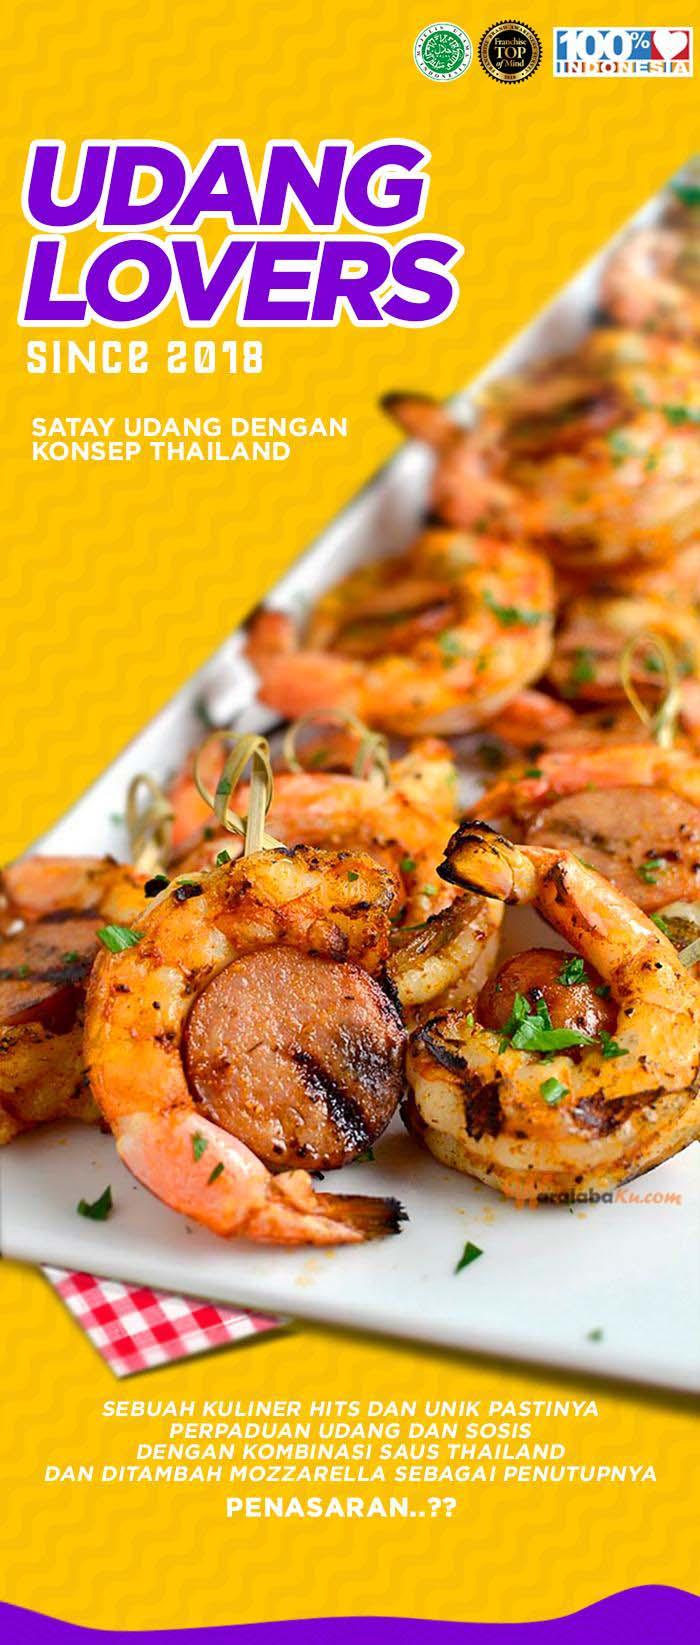 Franchise Seafood Udang Lovers Peluang Usaha Makanan Waralaba Ku